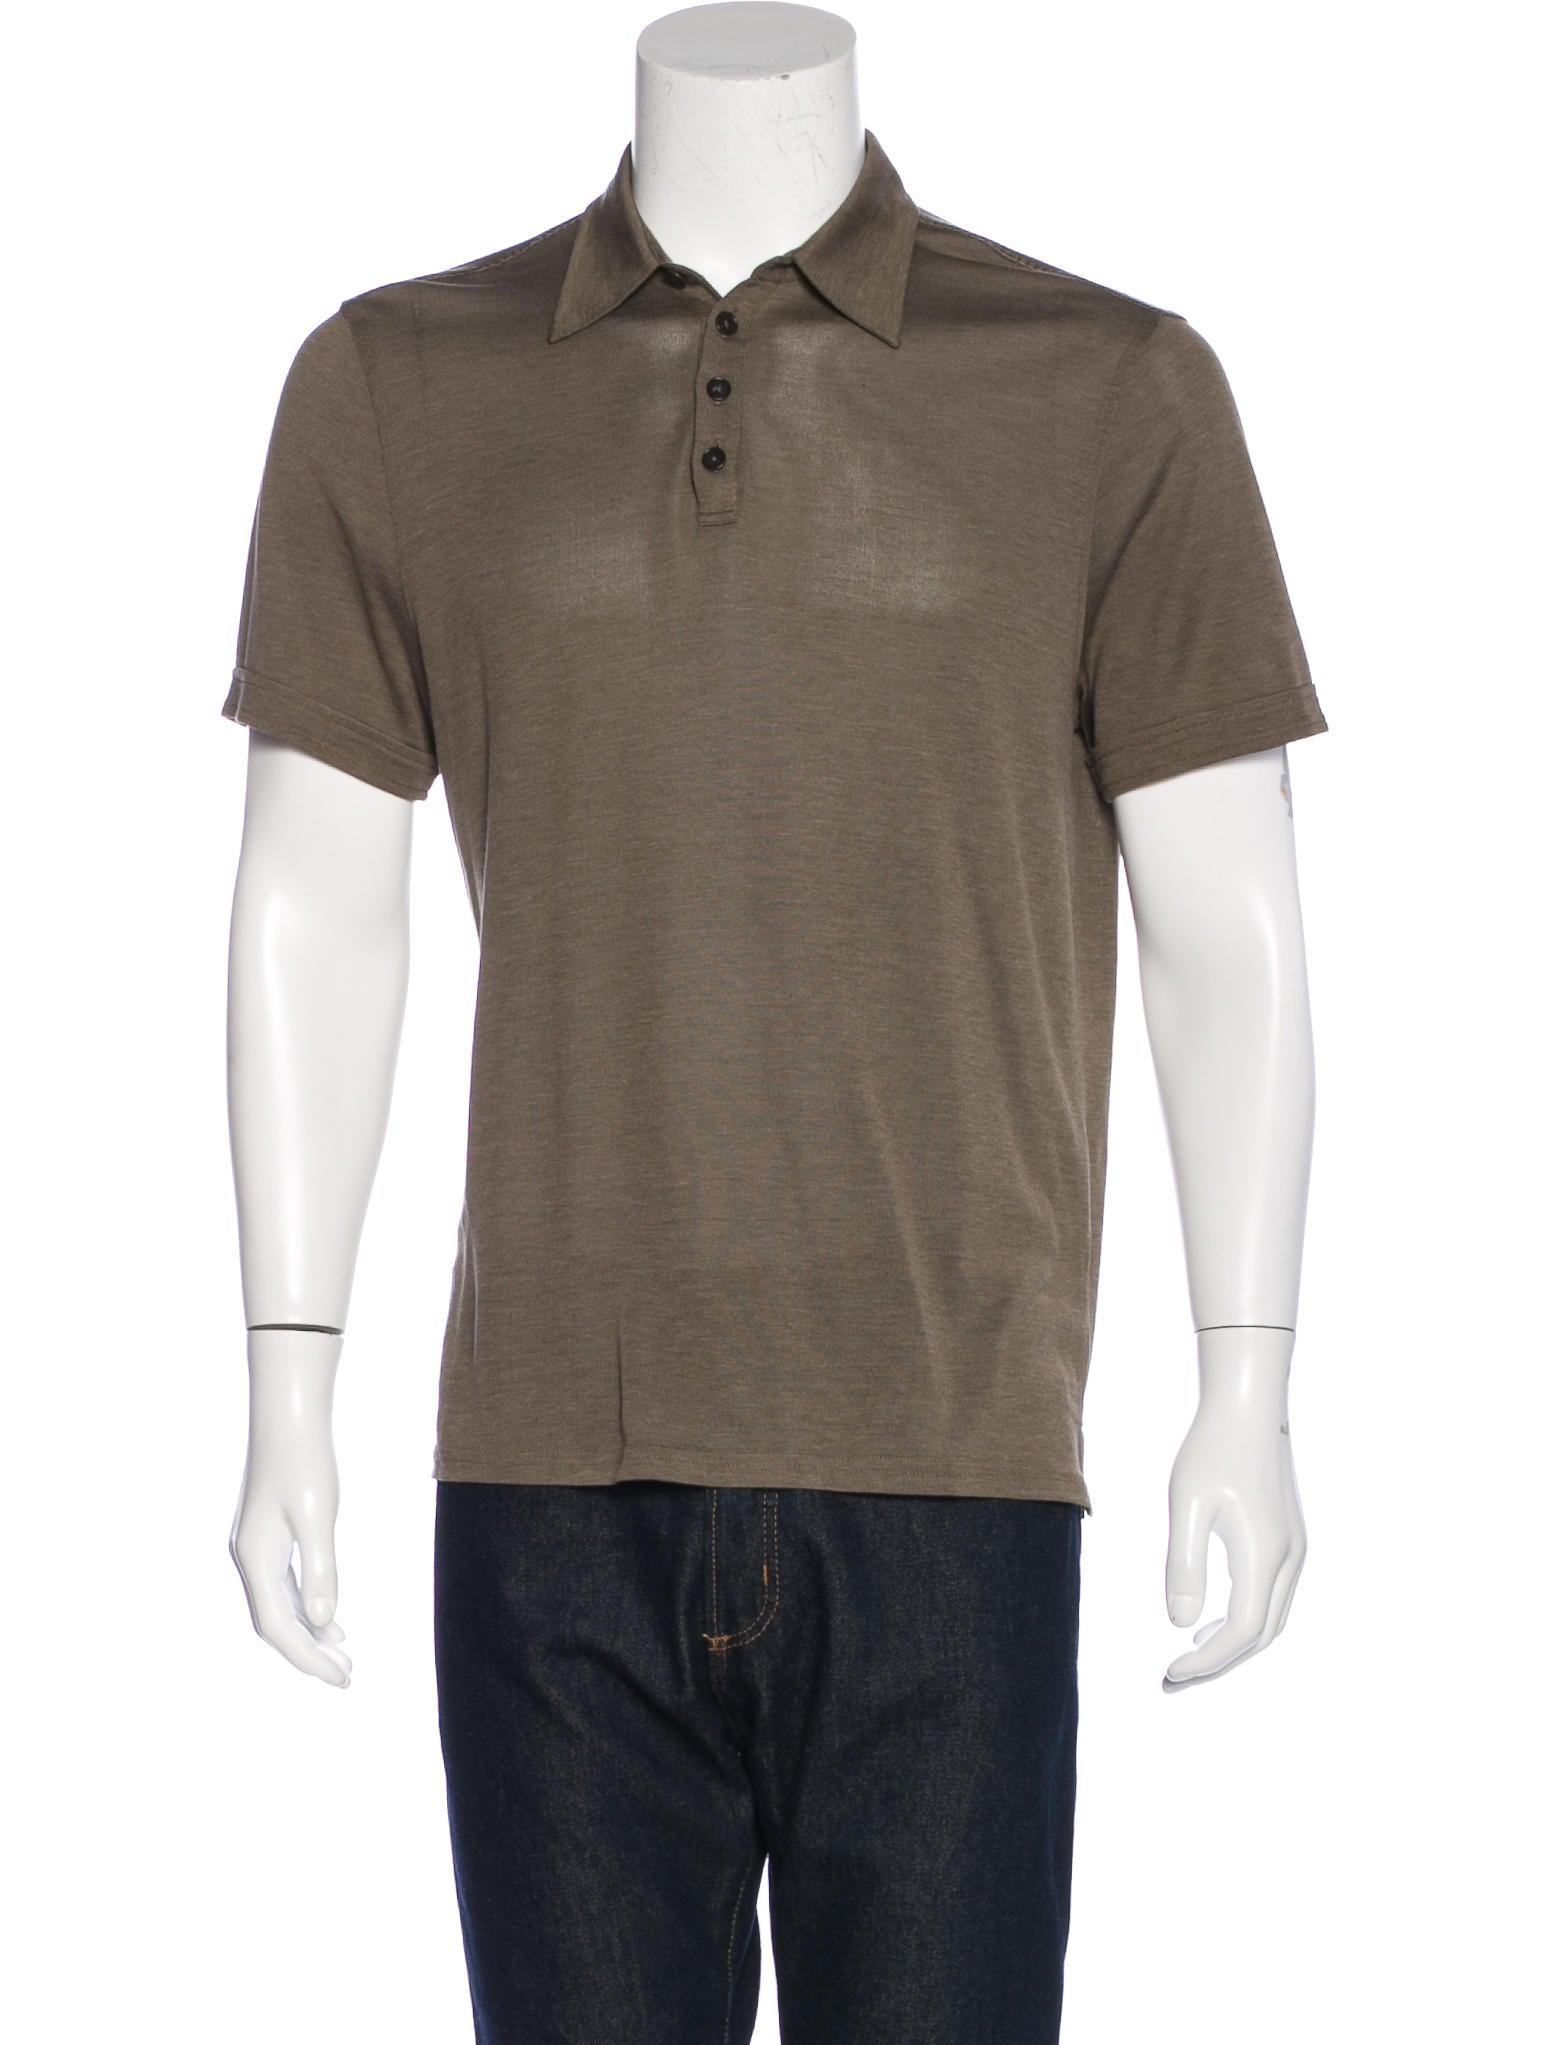 John Varvatos Silk Blend Polo Shirt Clothing Jva23740